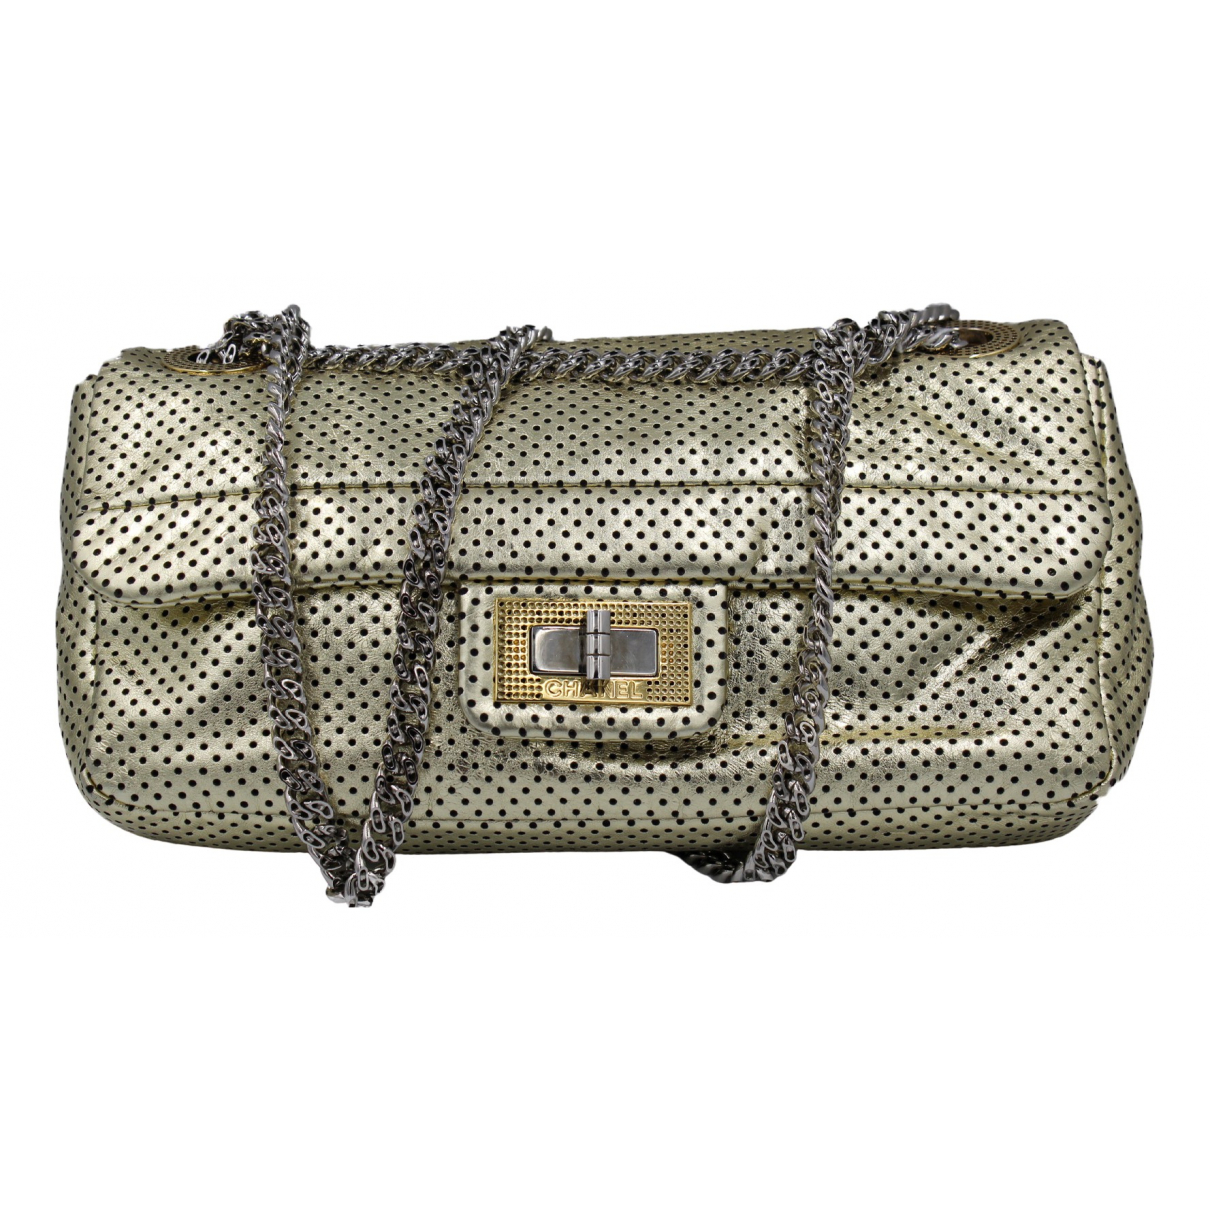 Chanel 2.55 Gold Leather handbag for Women N